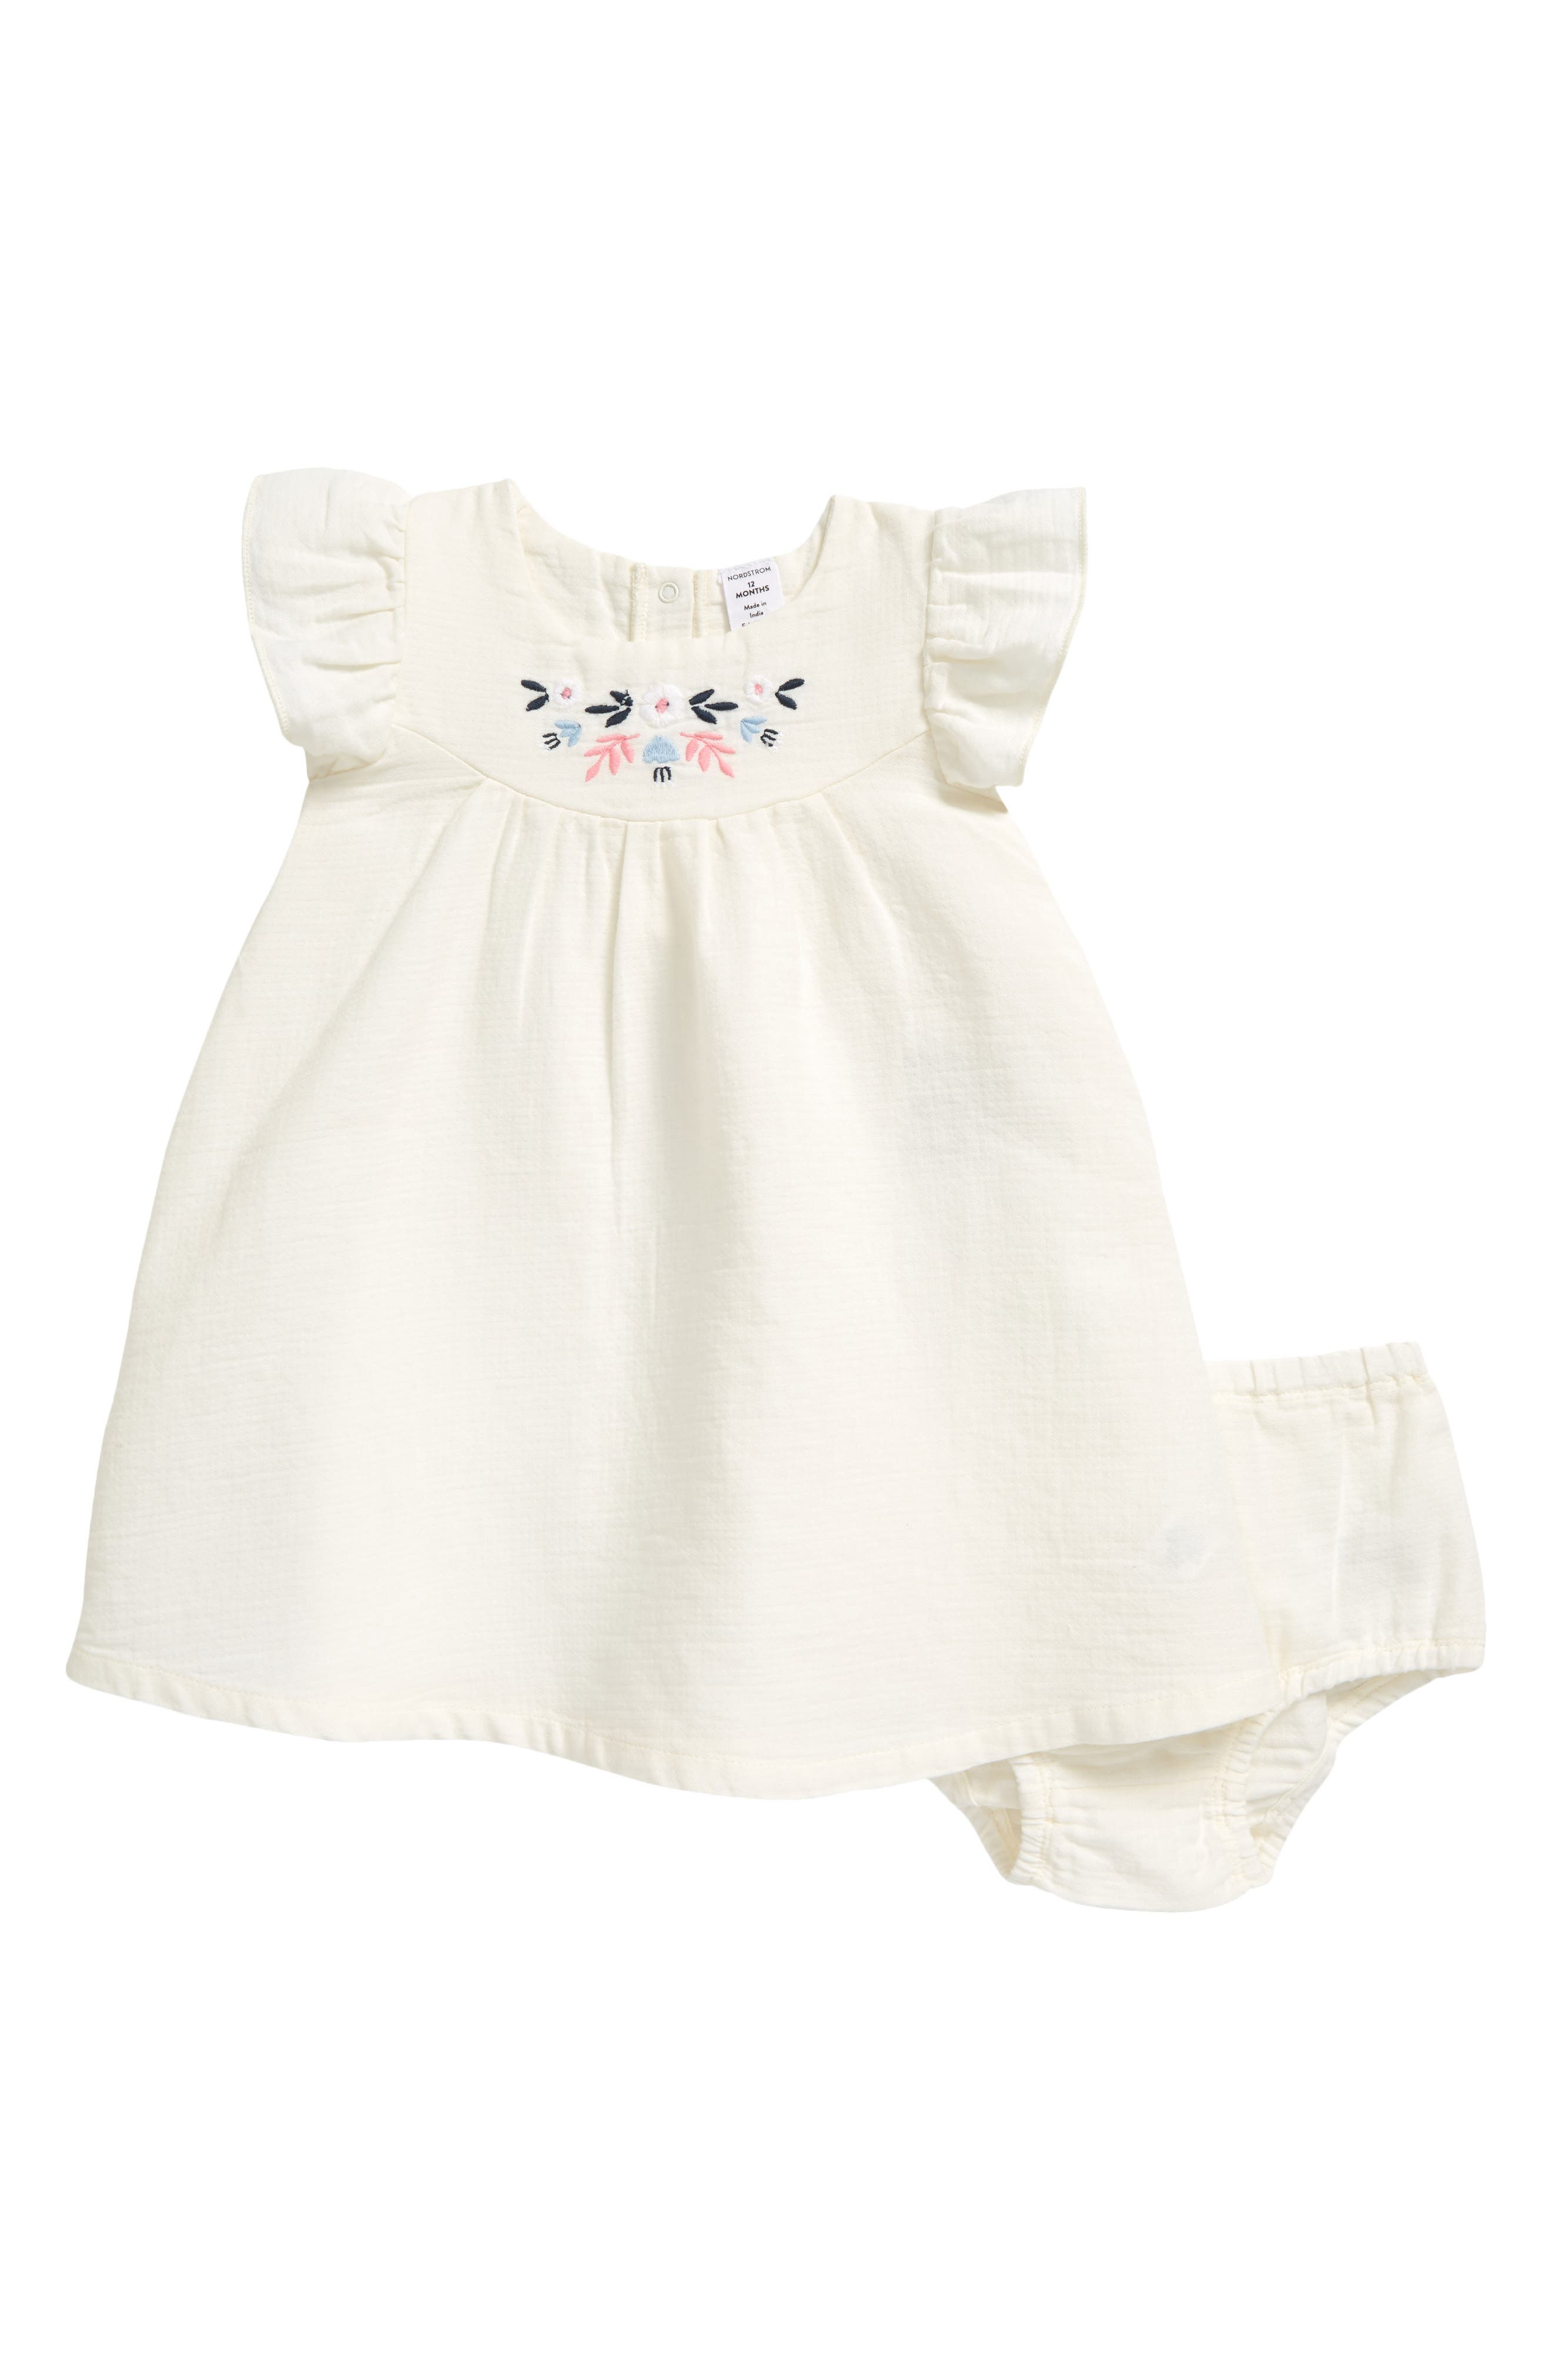 floral baby girl dress peach floral dress toddler spring dresses toddler Easter dress Easter outfits stretchy knit dress